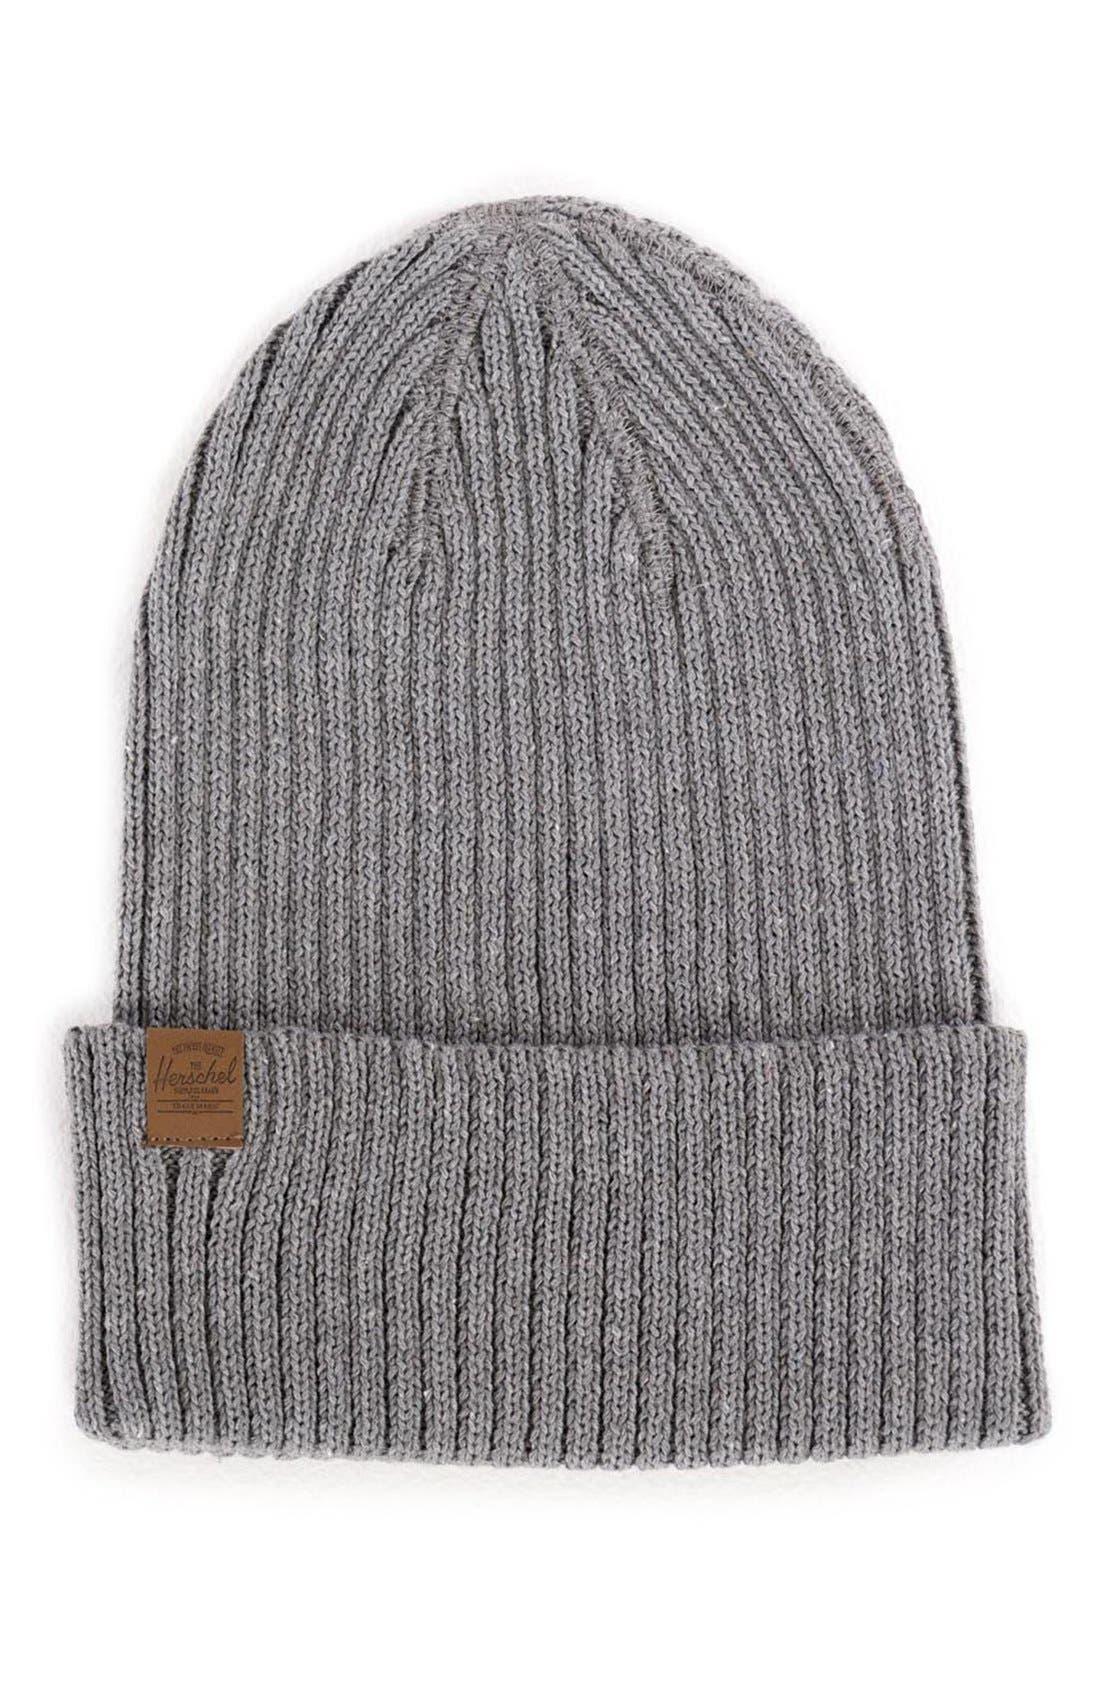 Alternate Image 1 Selected - Herschel Supply Co. 'Cast' Knit Cotton Beanie